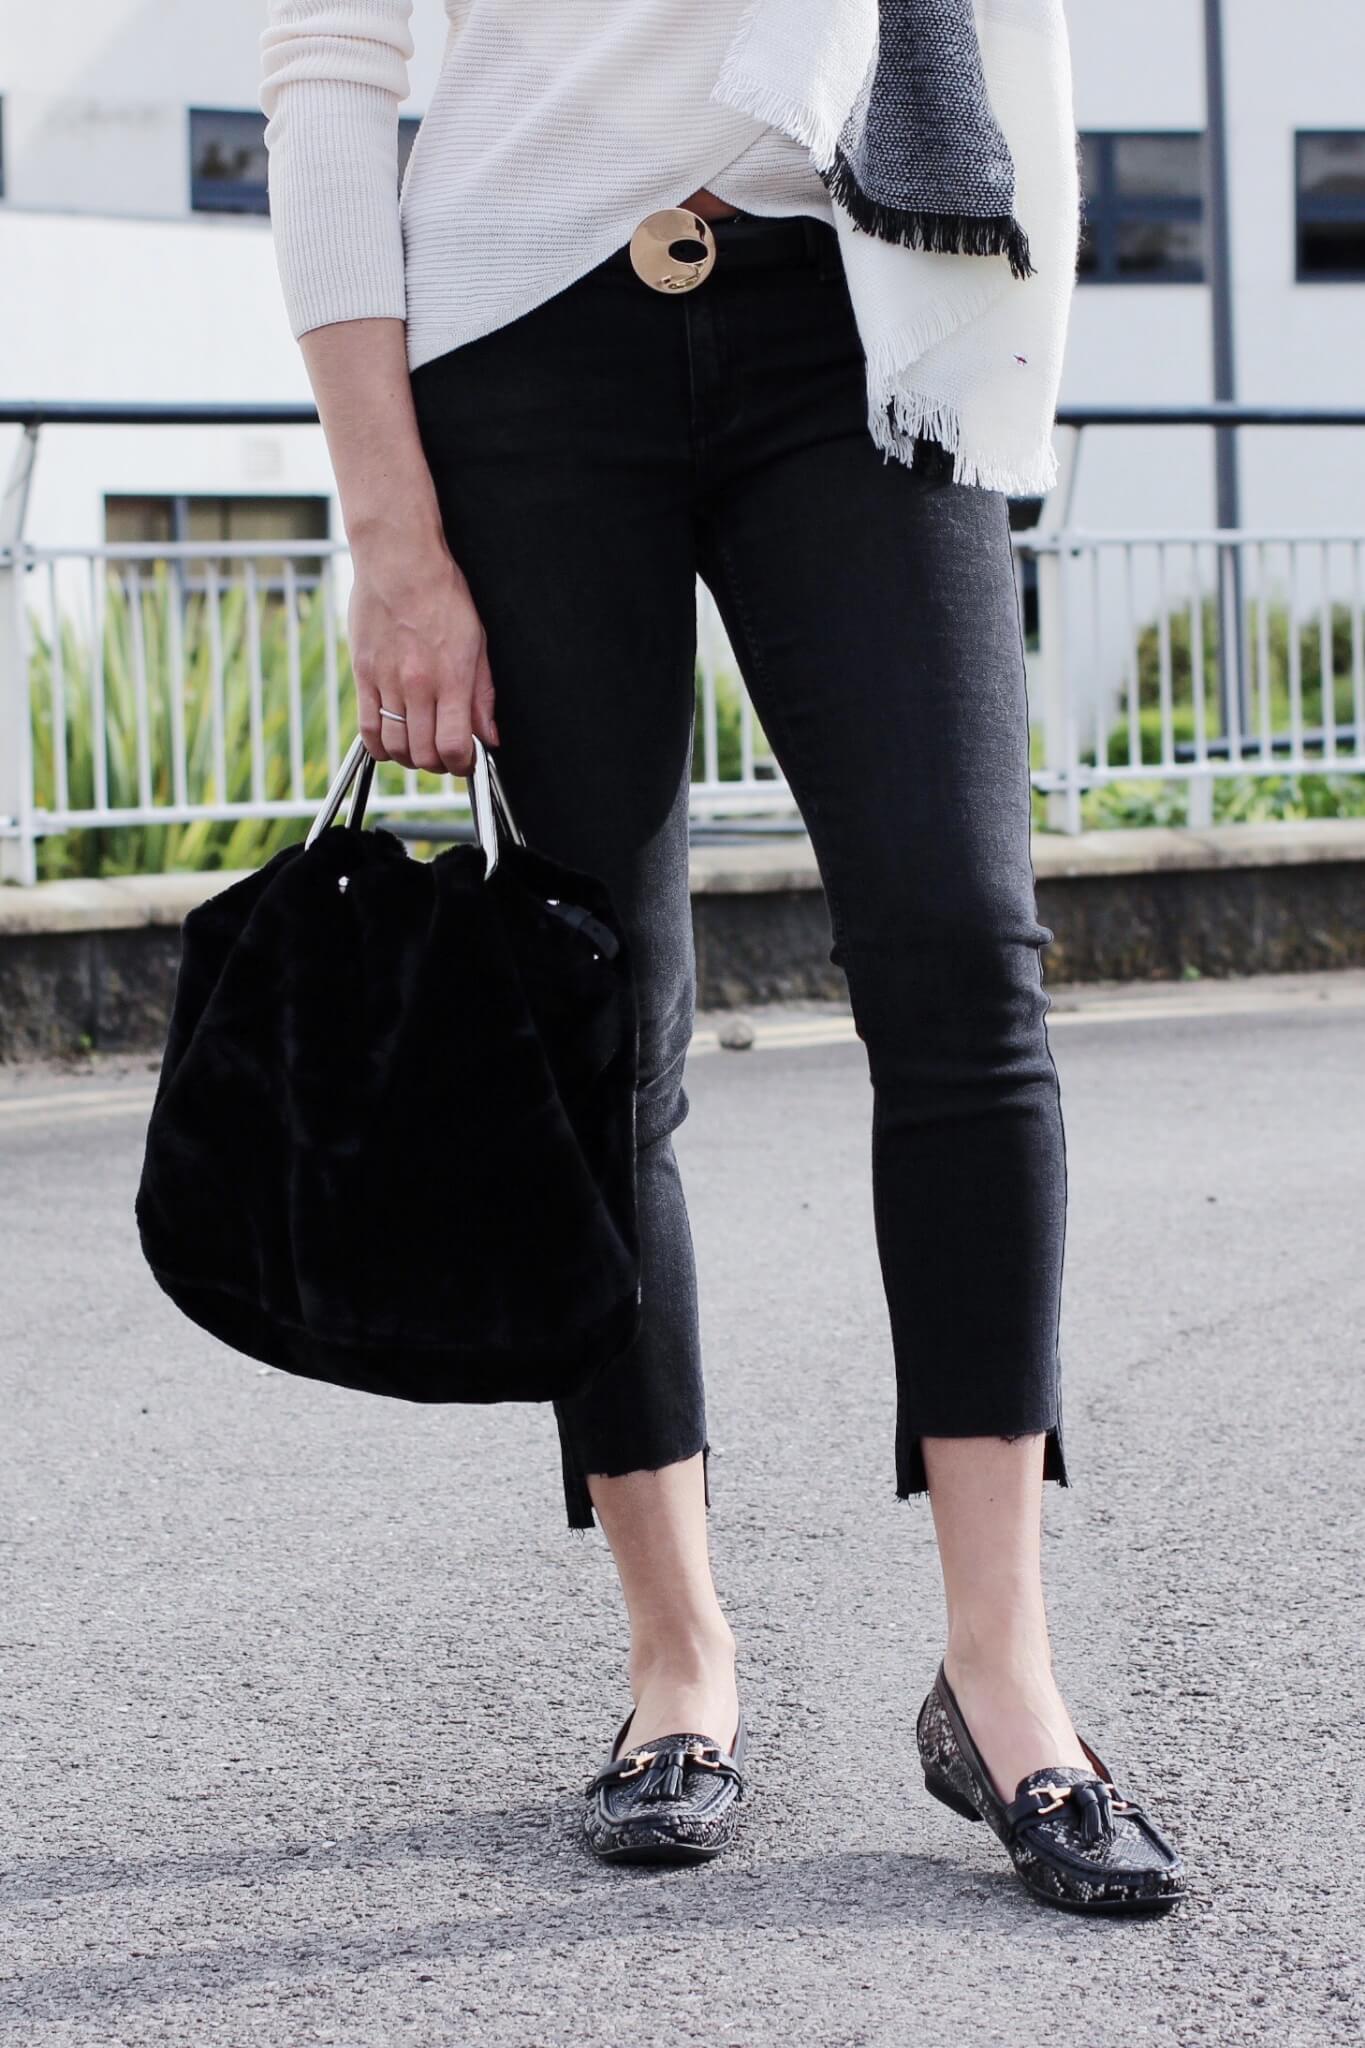 Styling Animal Print Shoes For Autumn Uk Fashion Blog High Street Style Lurchhoundloves